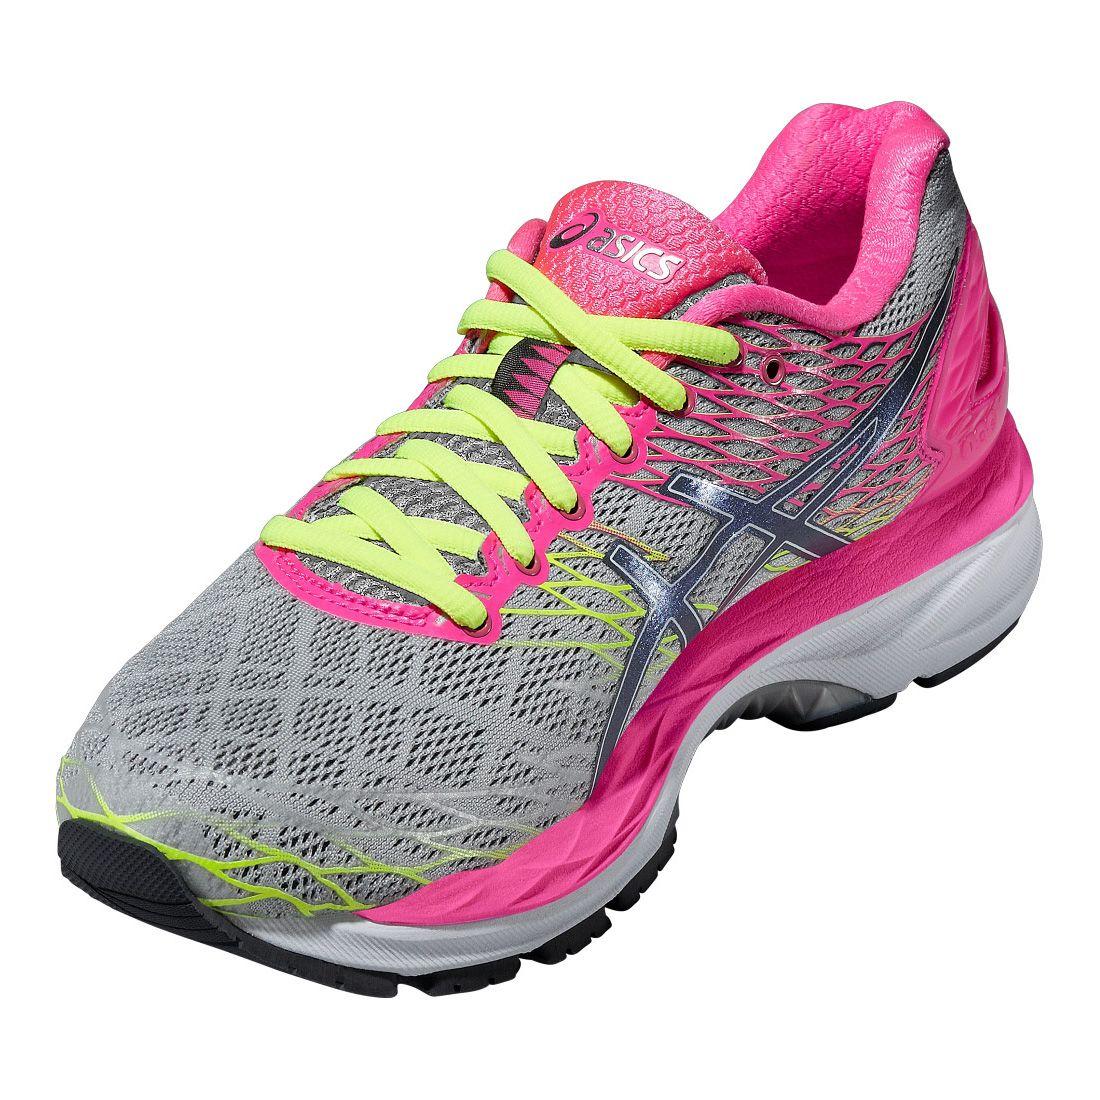 Asics Size Ladies Shoes